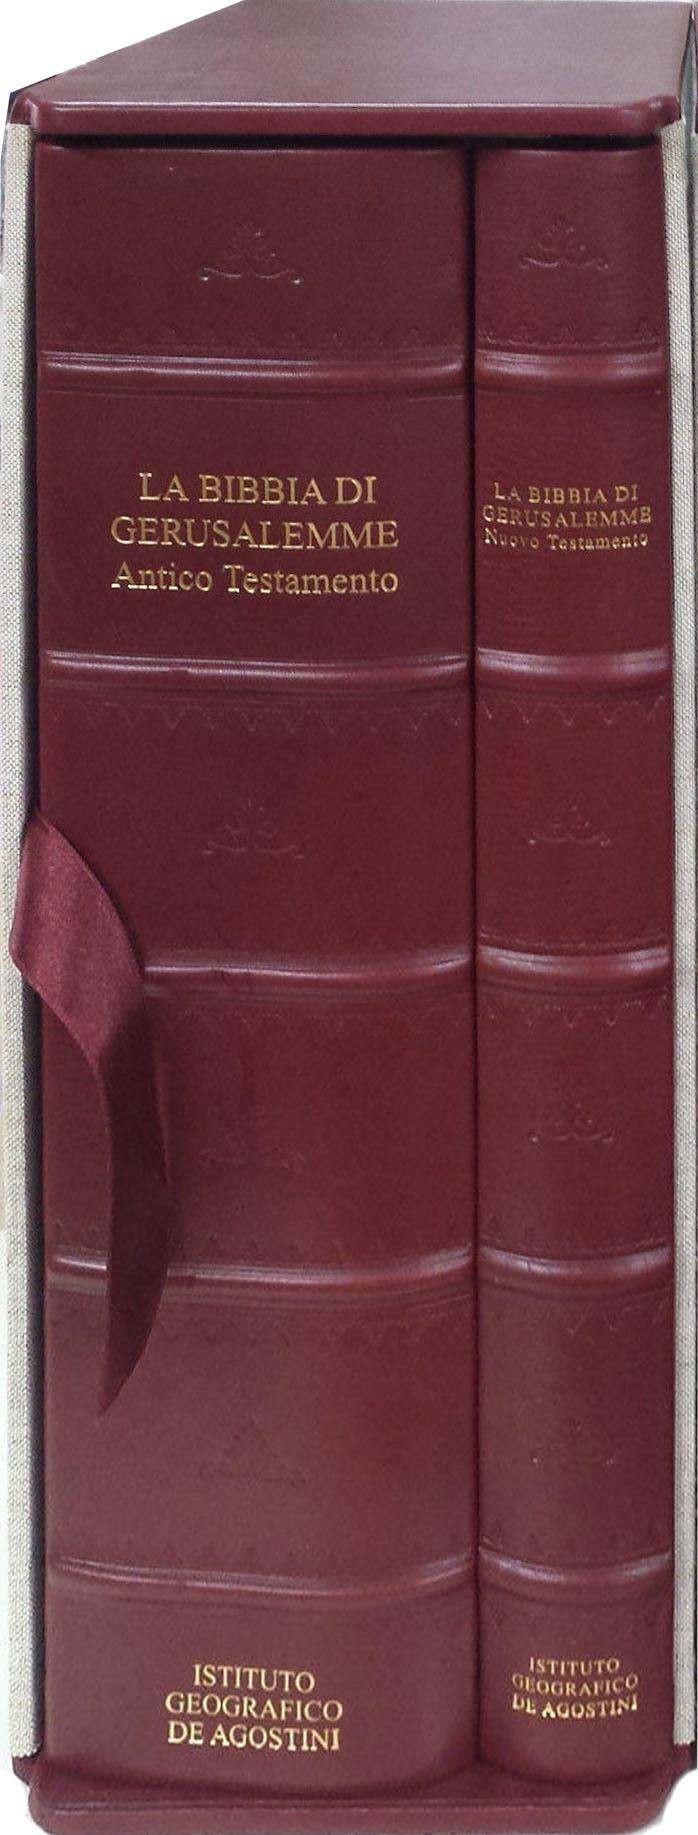 La bibbia di Gerusalemme – DeAgostini